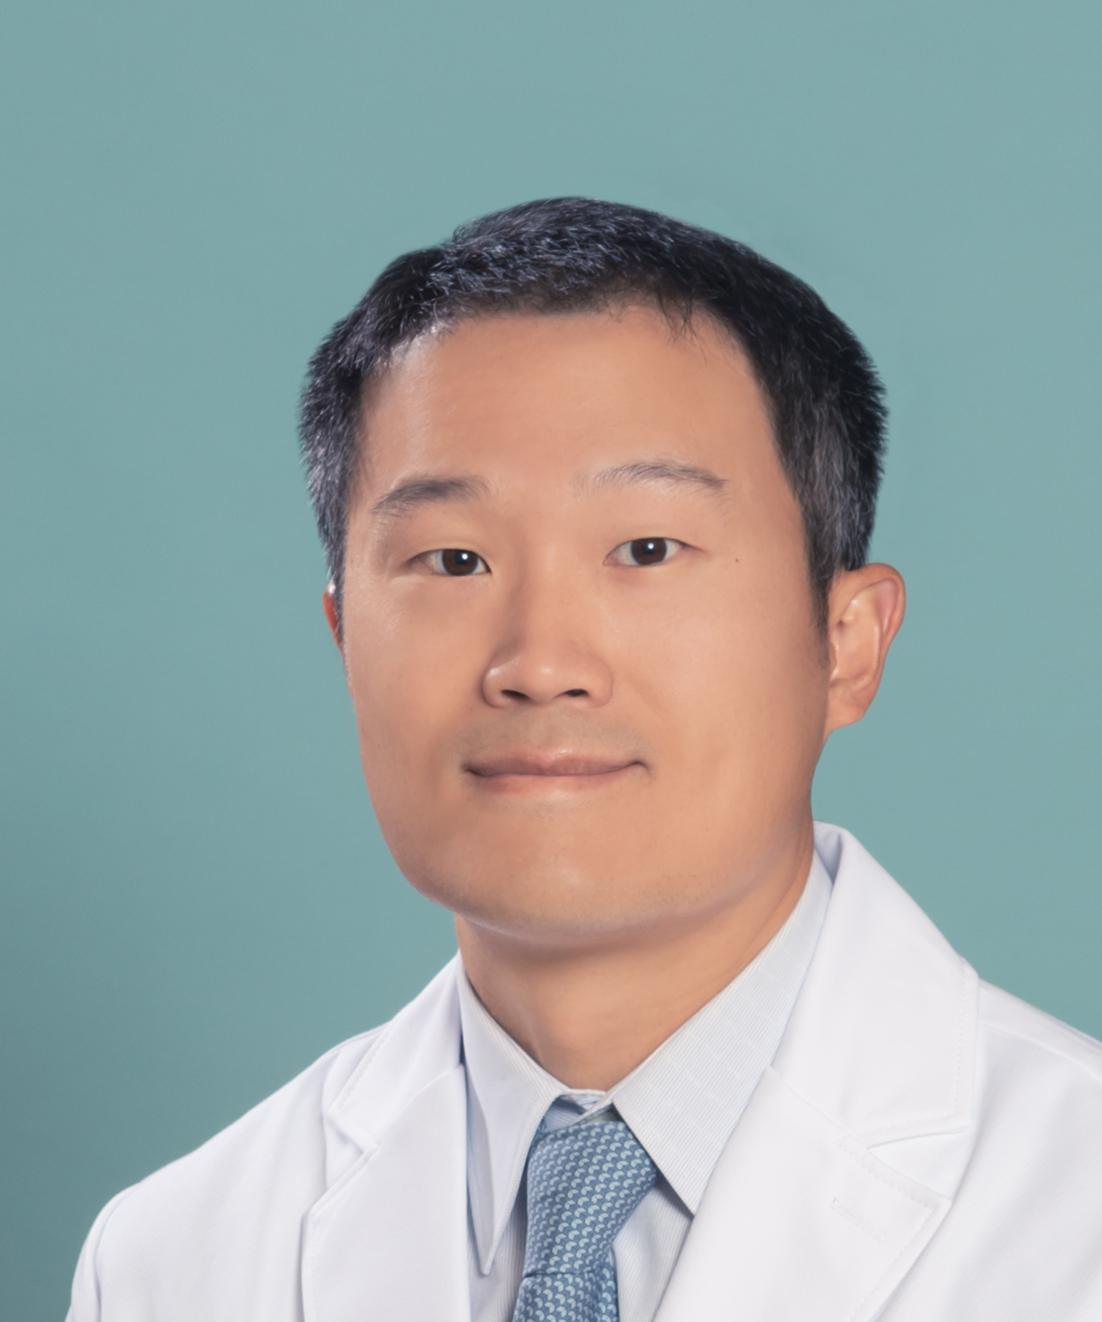 Provider photo for Alexander Choo